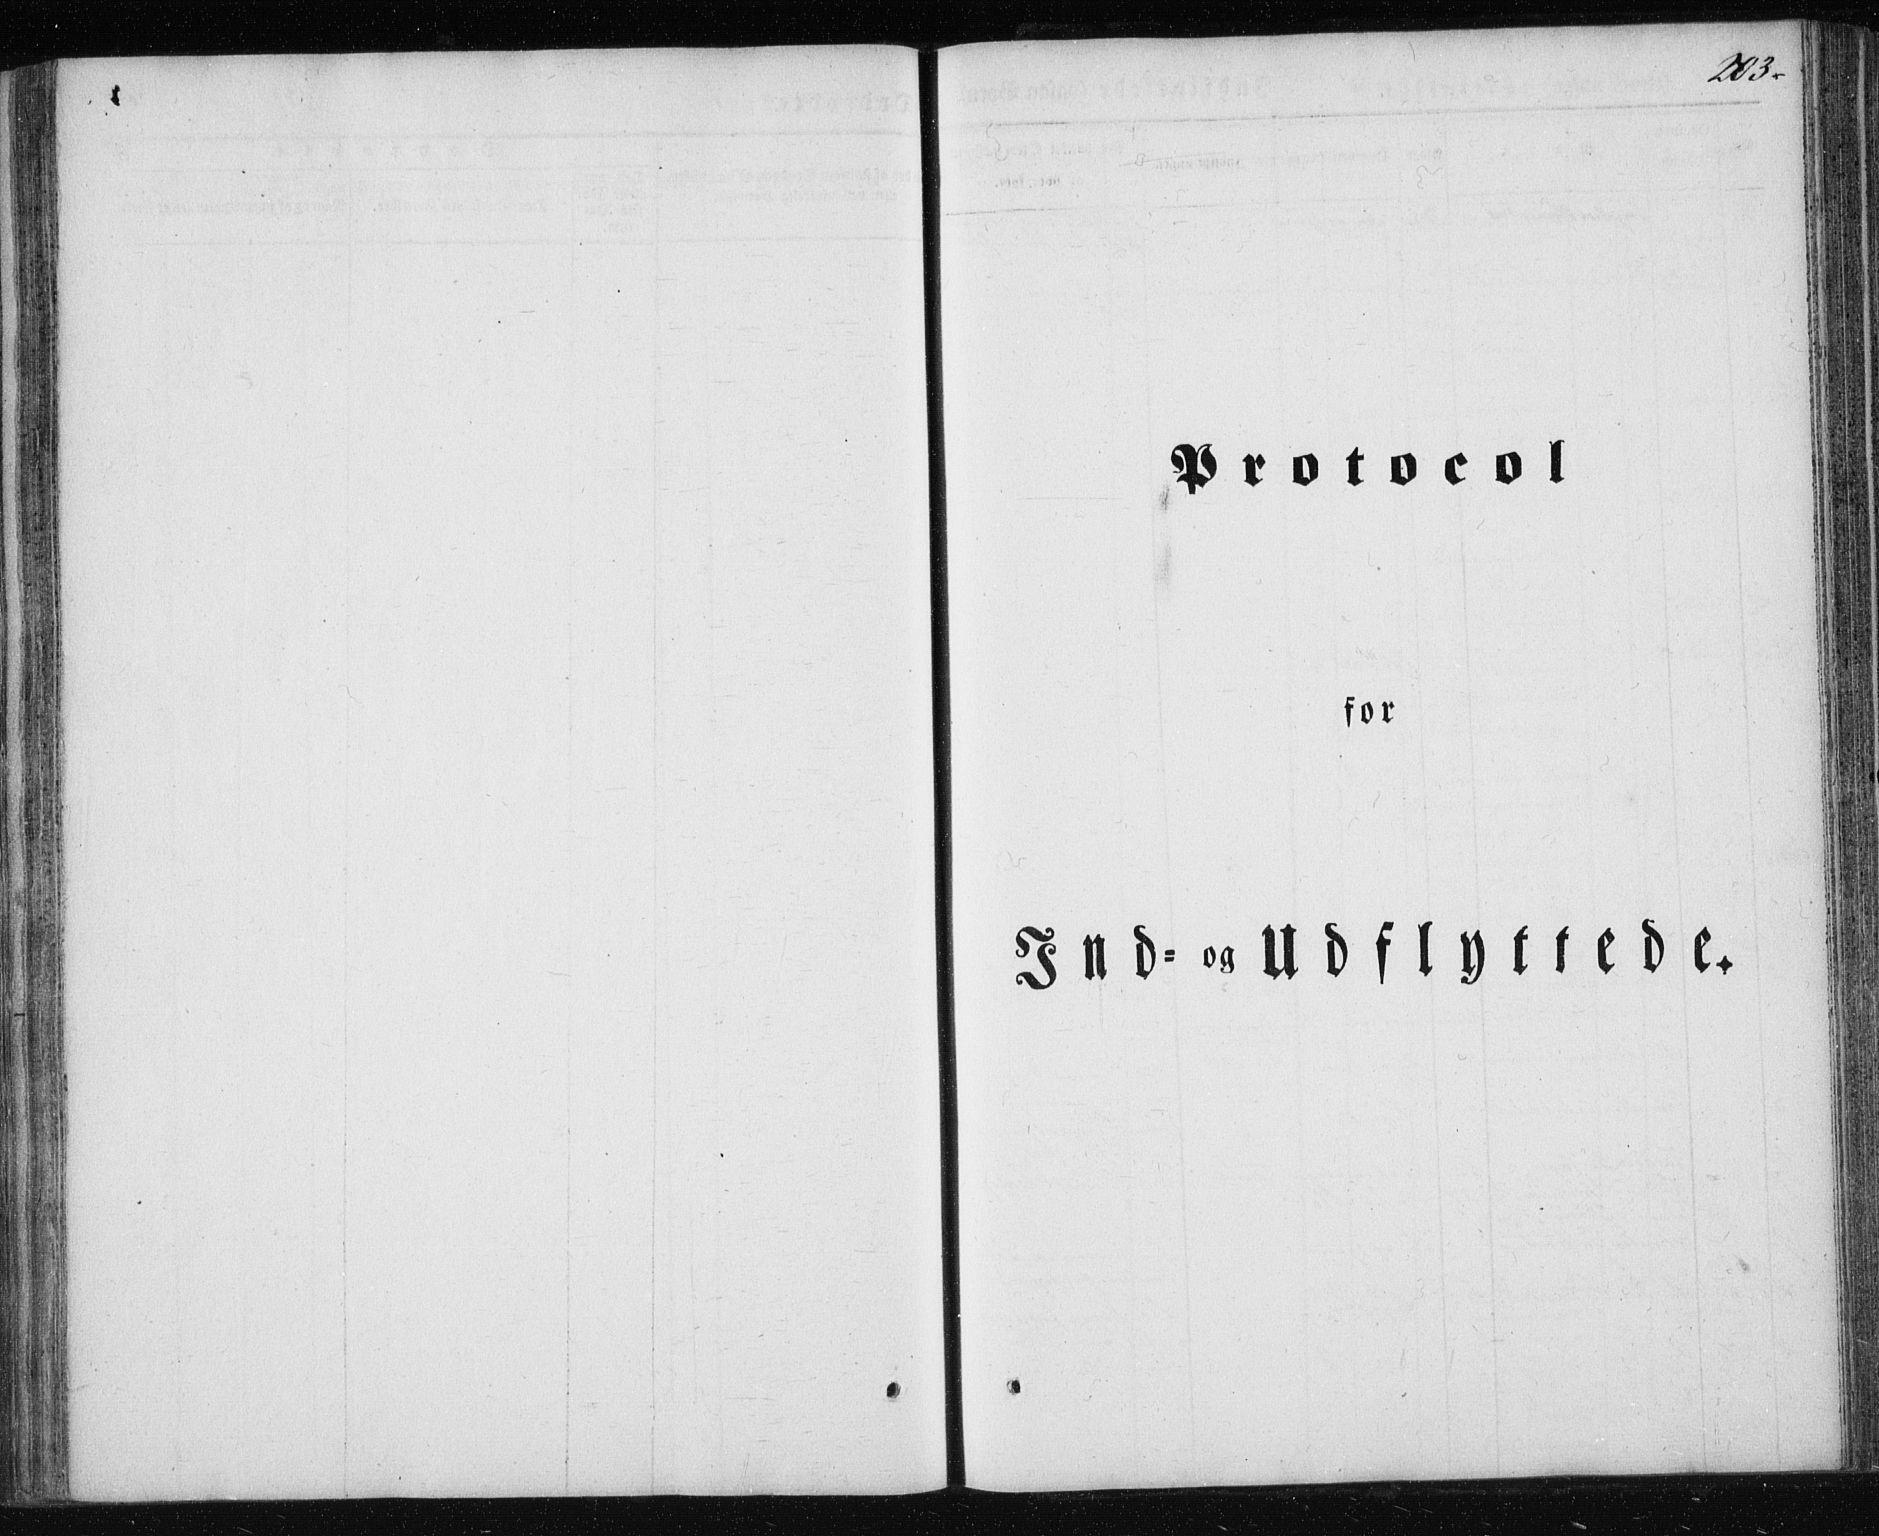 SAT, Ministerialprotokoller, klokkerbøker og fødselsregistre - Nordland, 827/L0391: Ministerialbok nr. 827A03, 1842-1852, s. 203